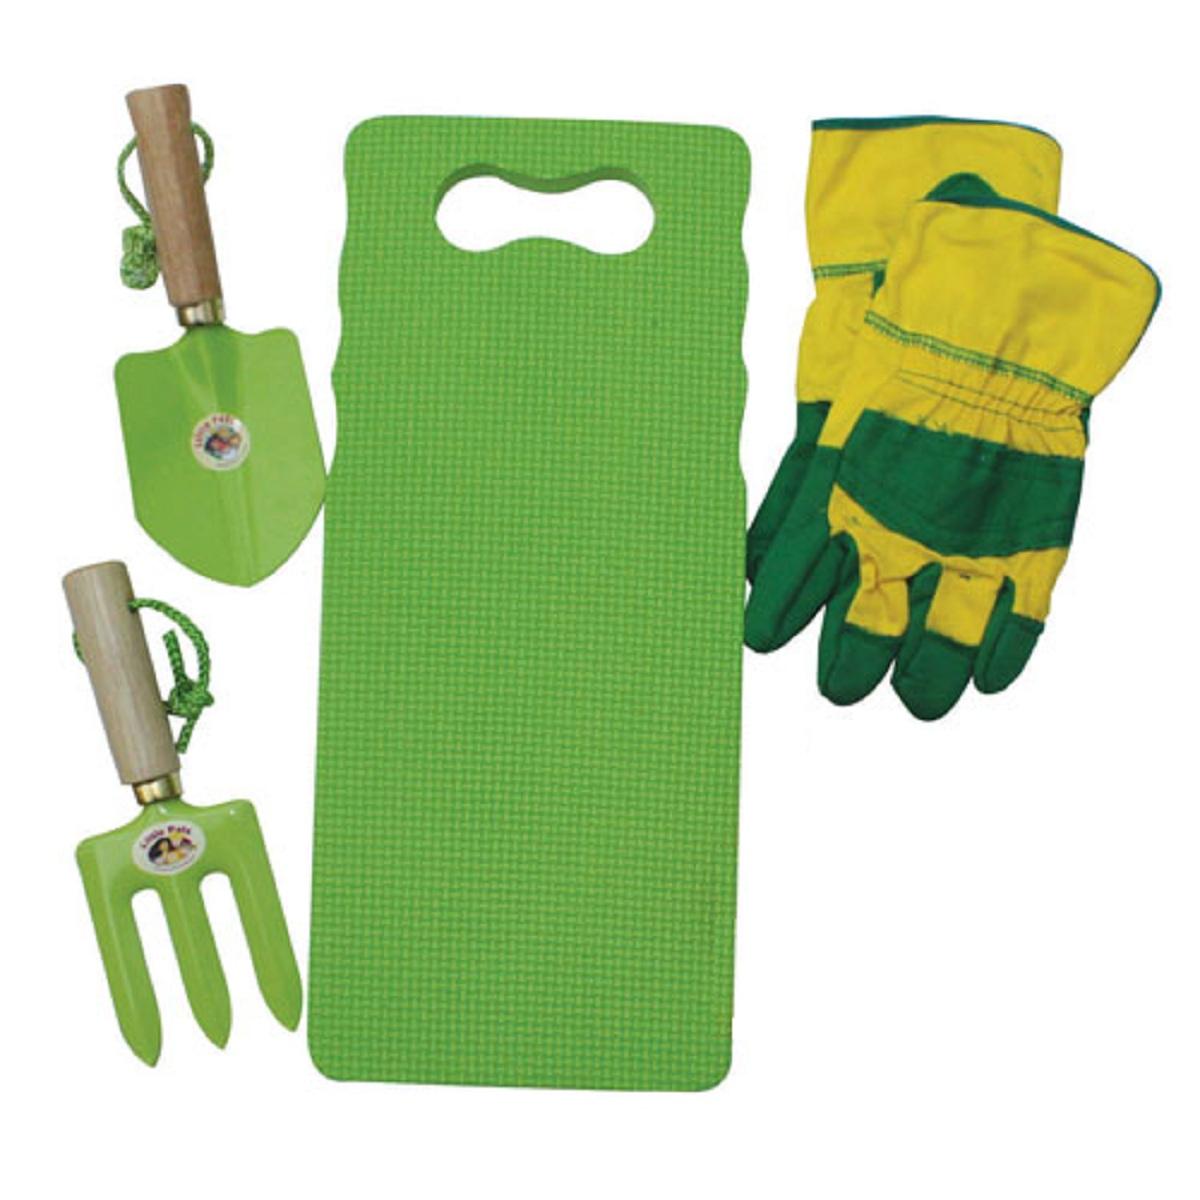 Childrens Green Activity Gardening Kit